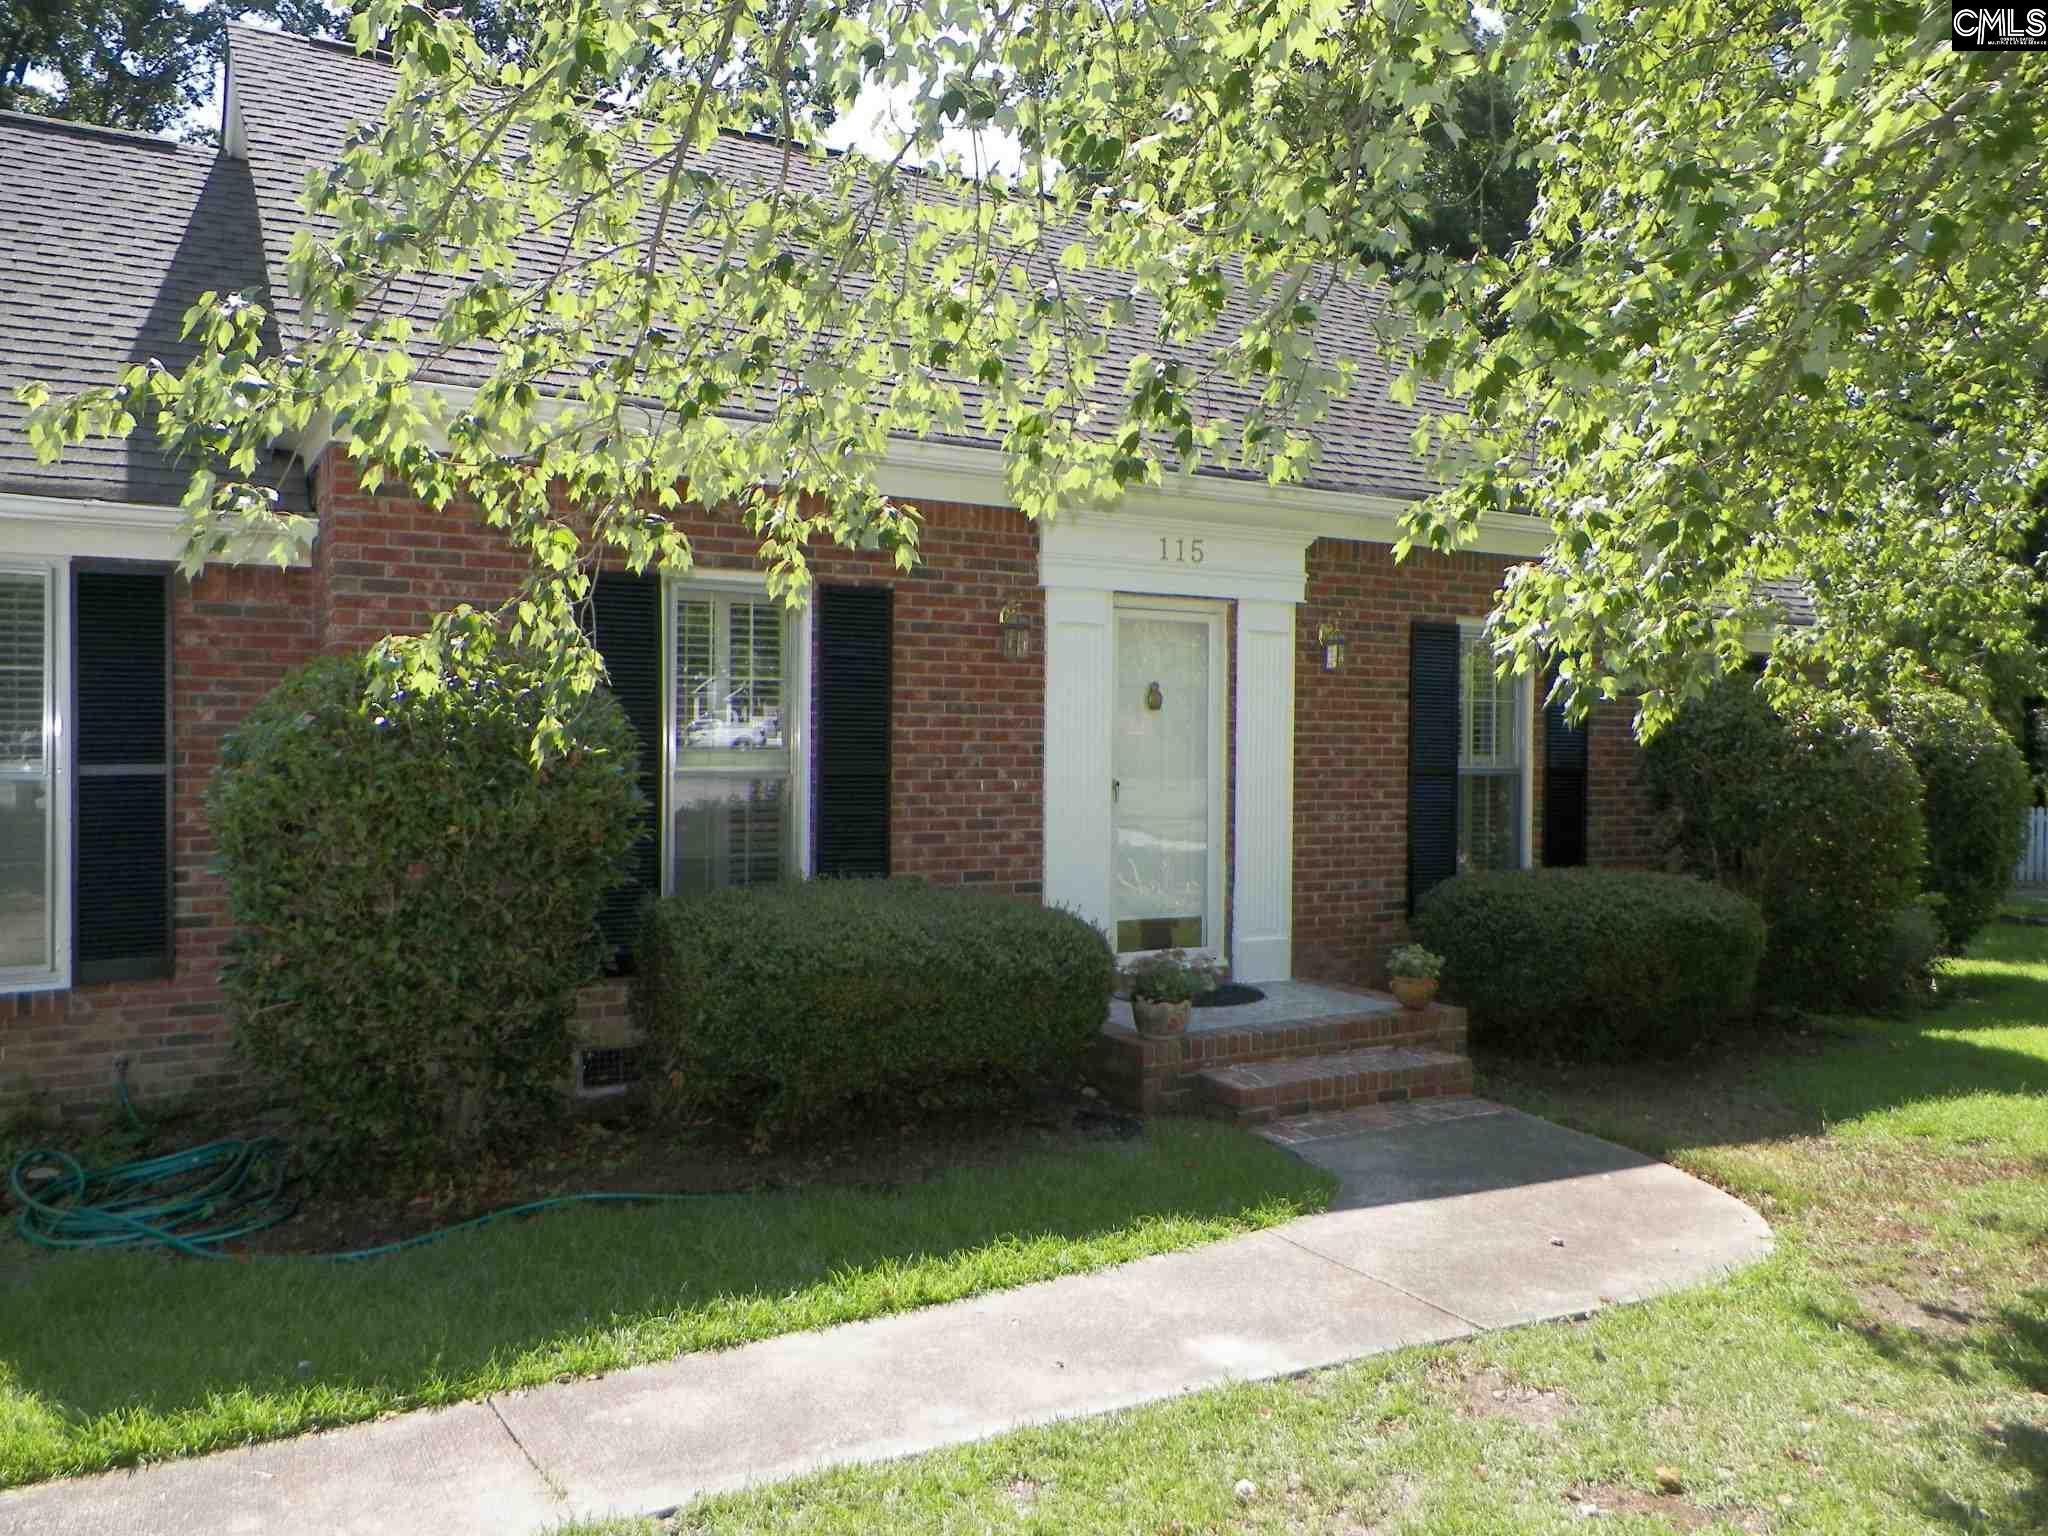 115 Palace Green Columbia, SC 29210-4520